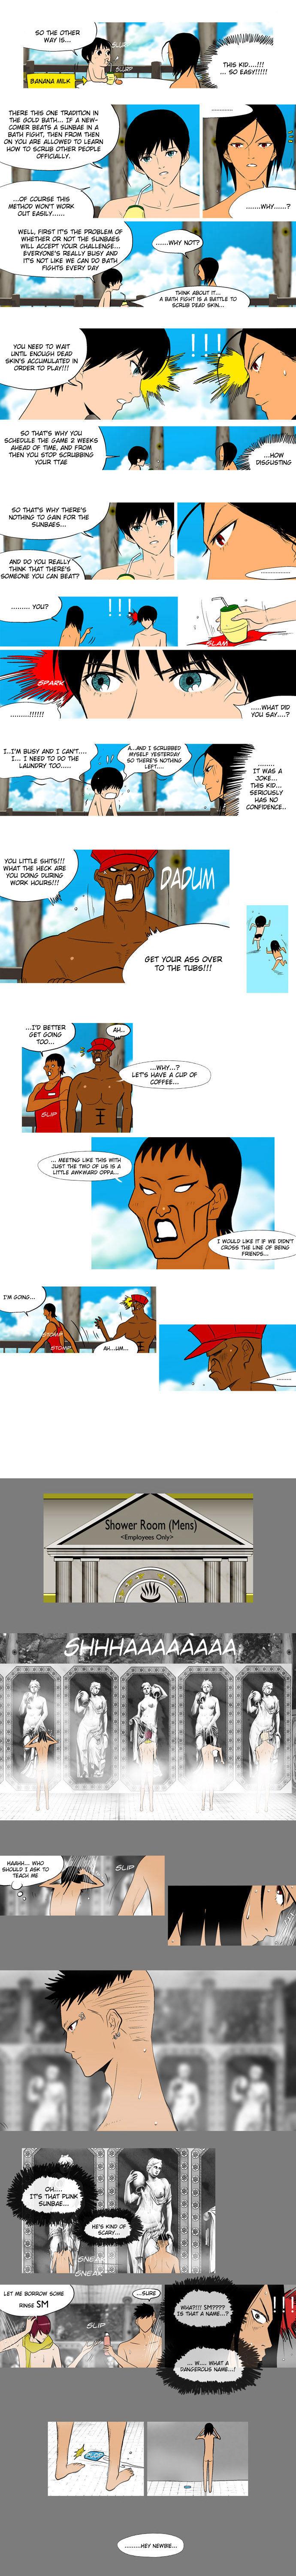 God of Bath 6 Page 3